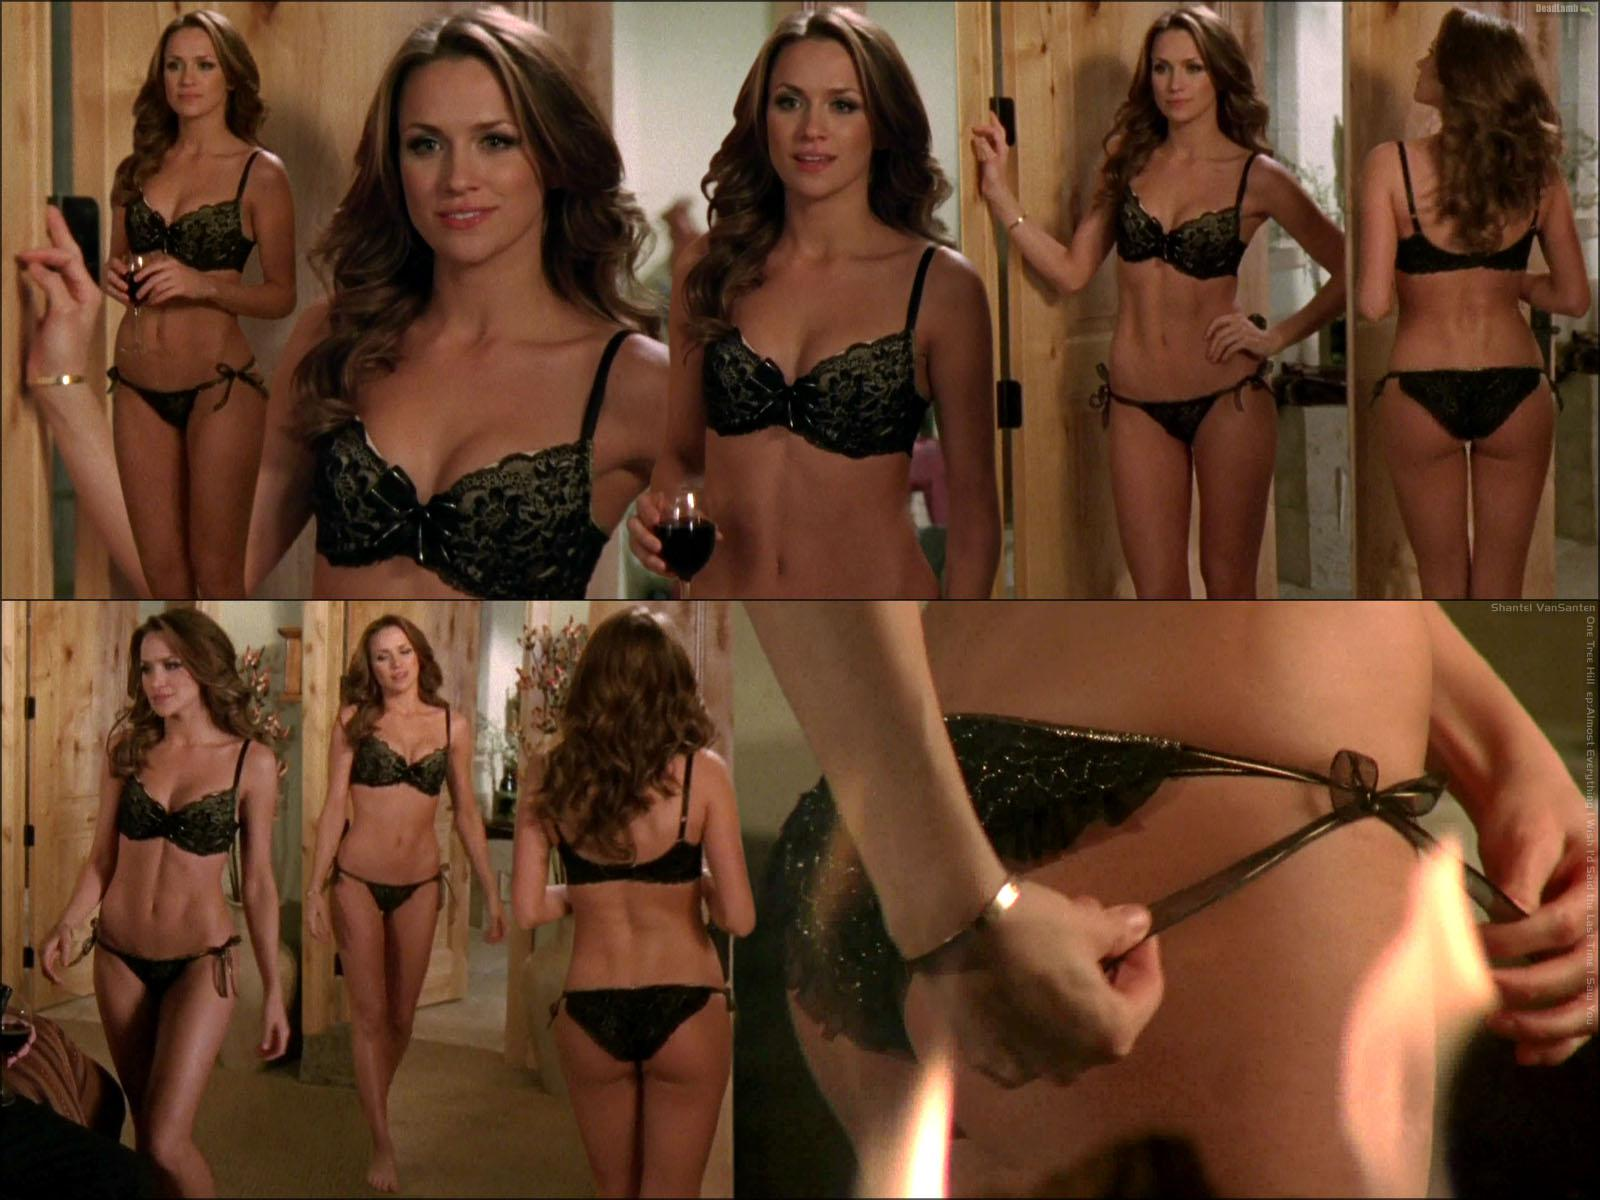 Shantel vansanten naked nude (69 photo)